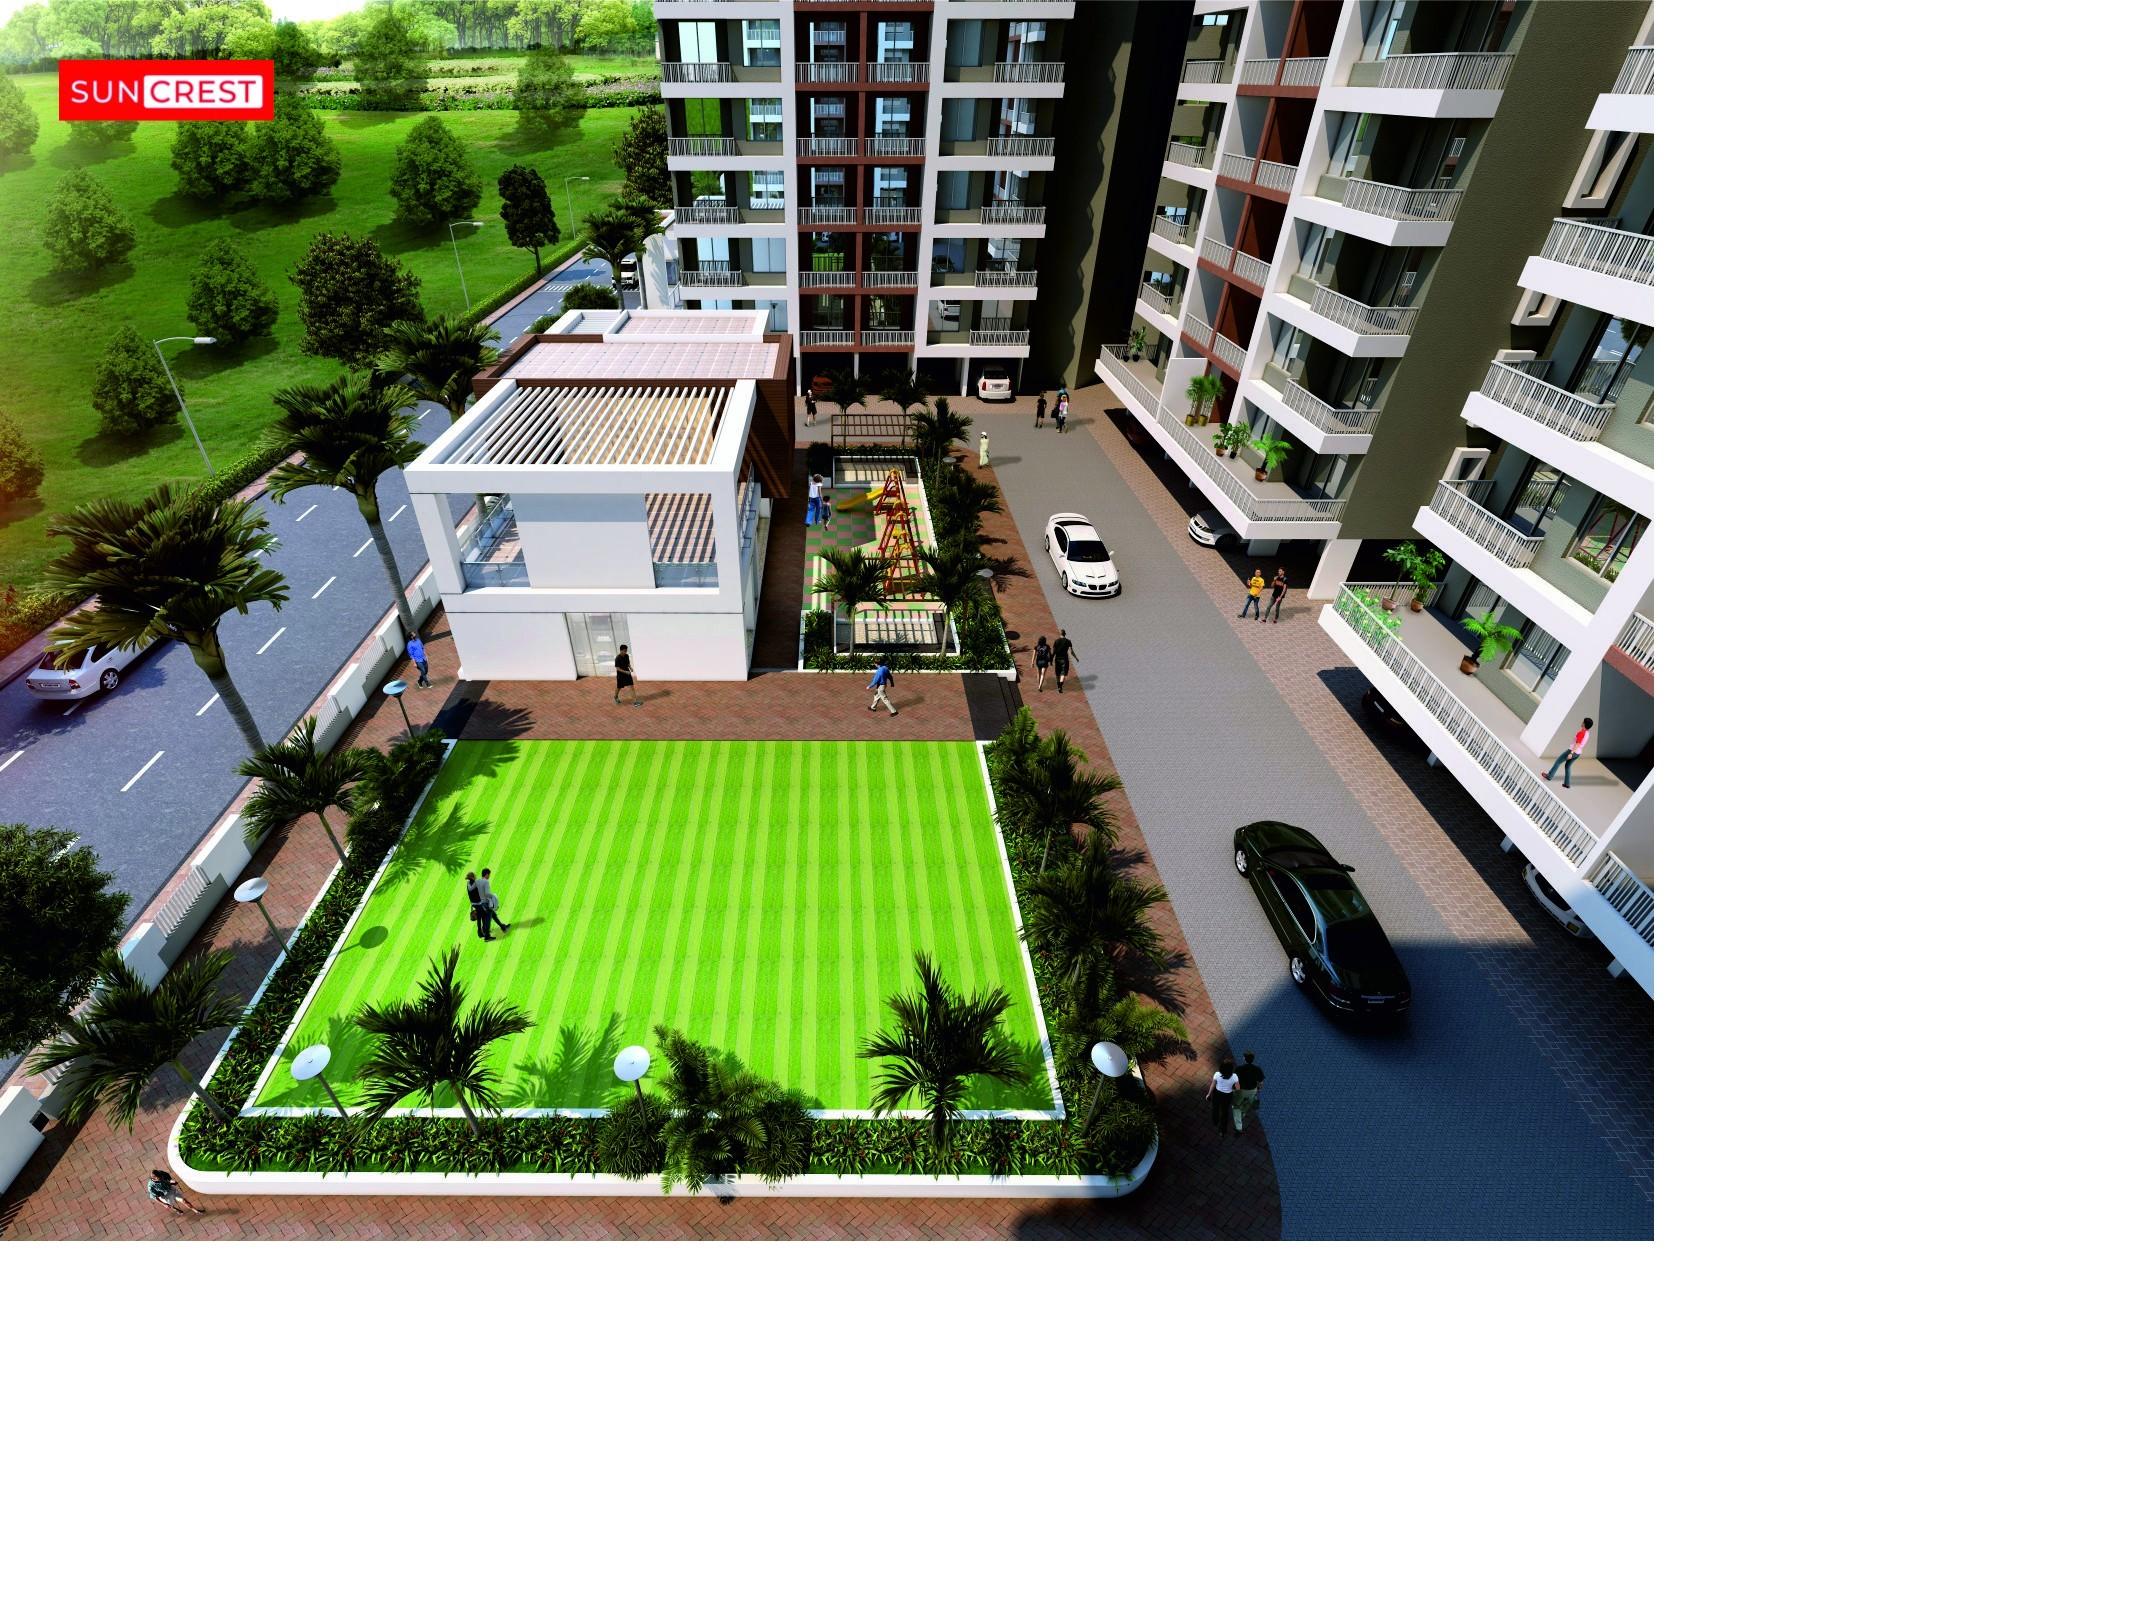 2 Bhk Flats in Dhayari Pune | Sun Crest - Mittal Builders Pune